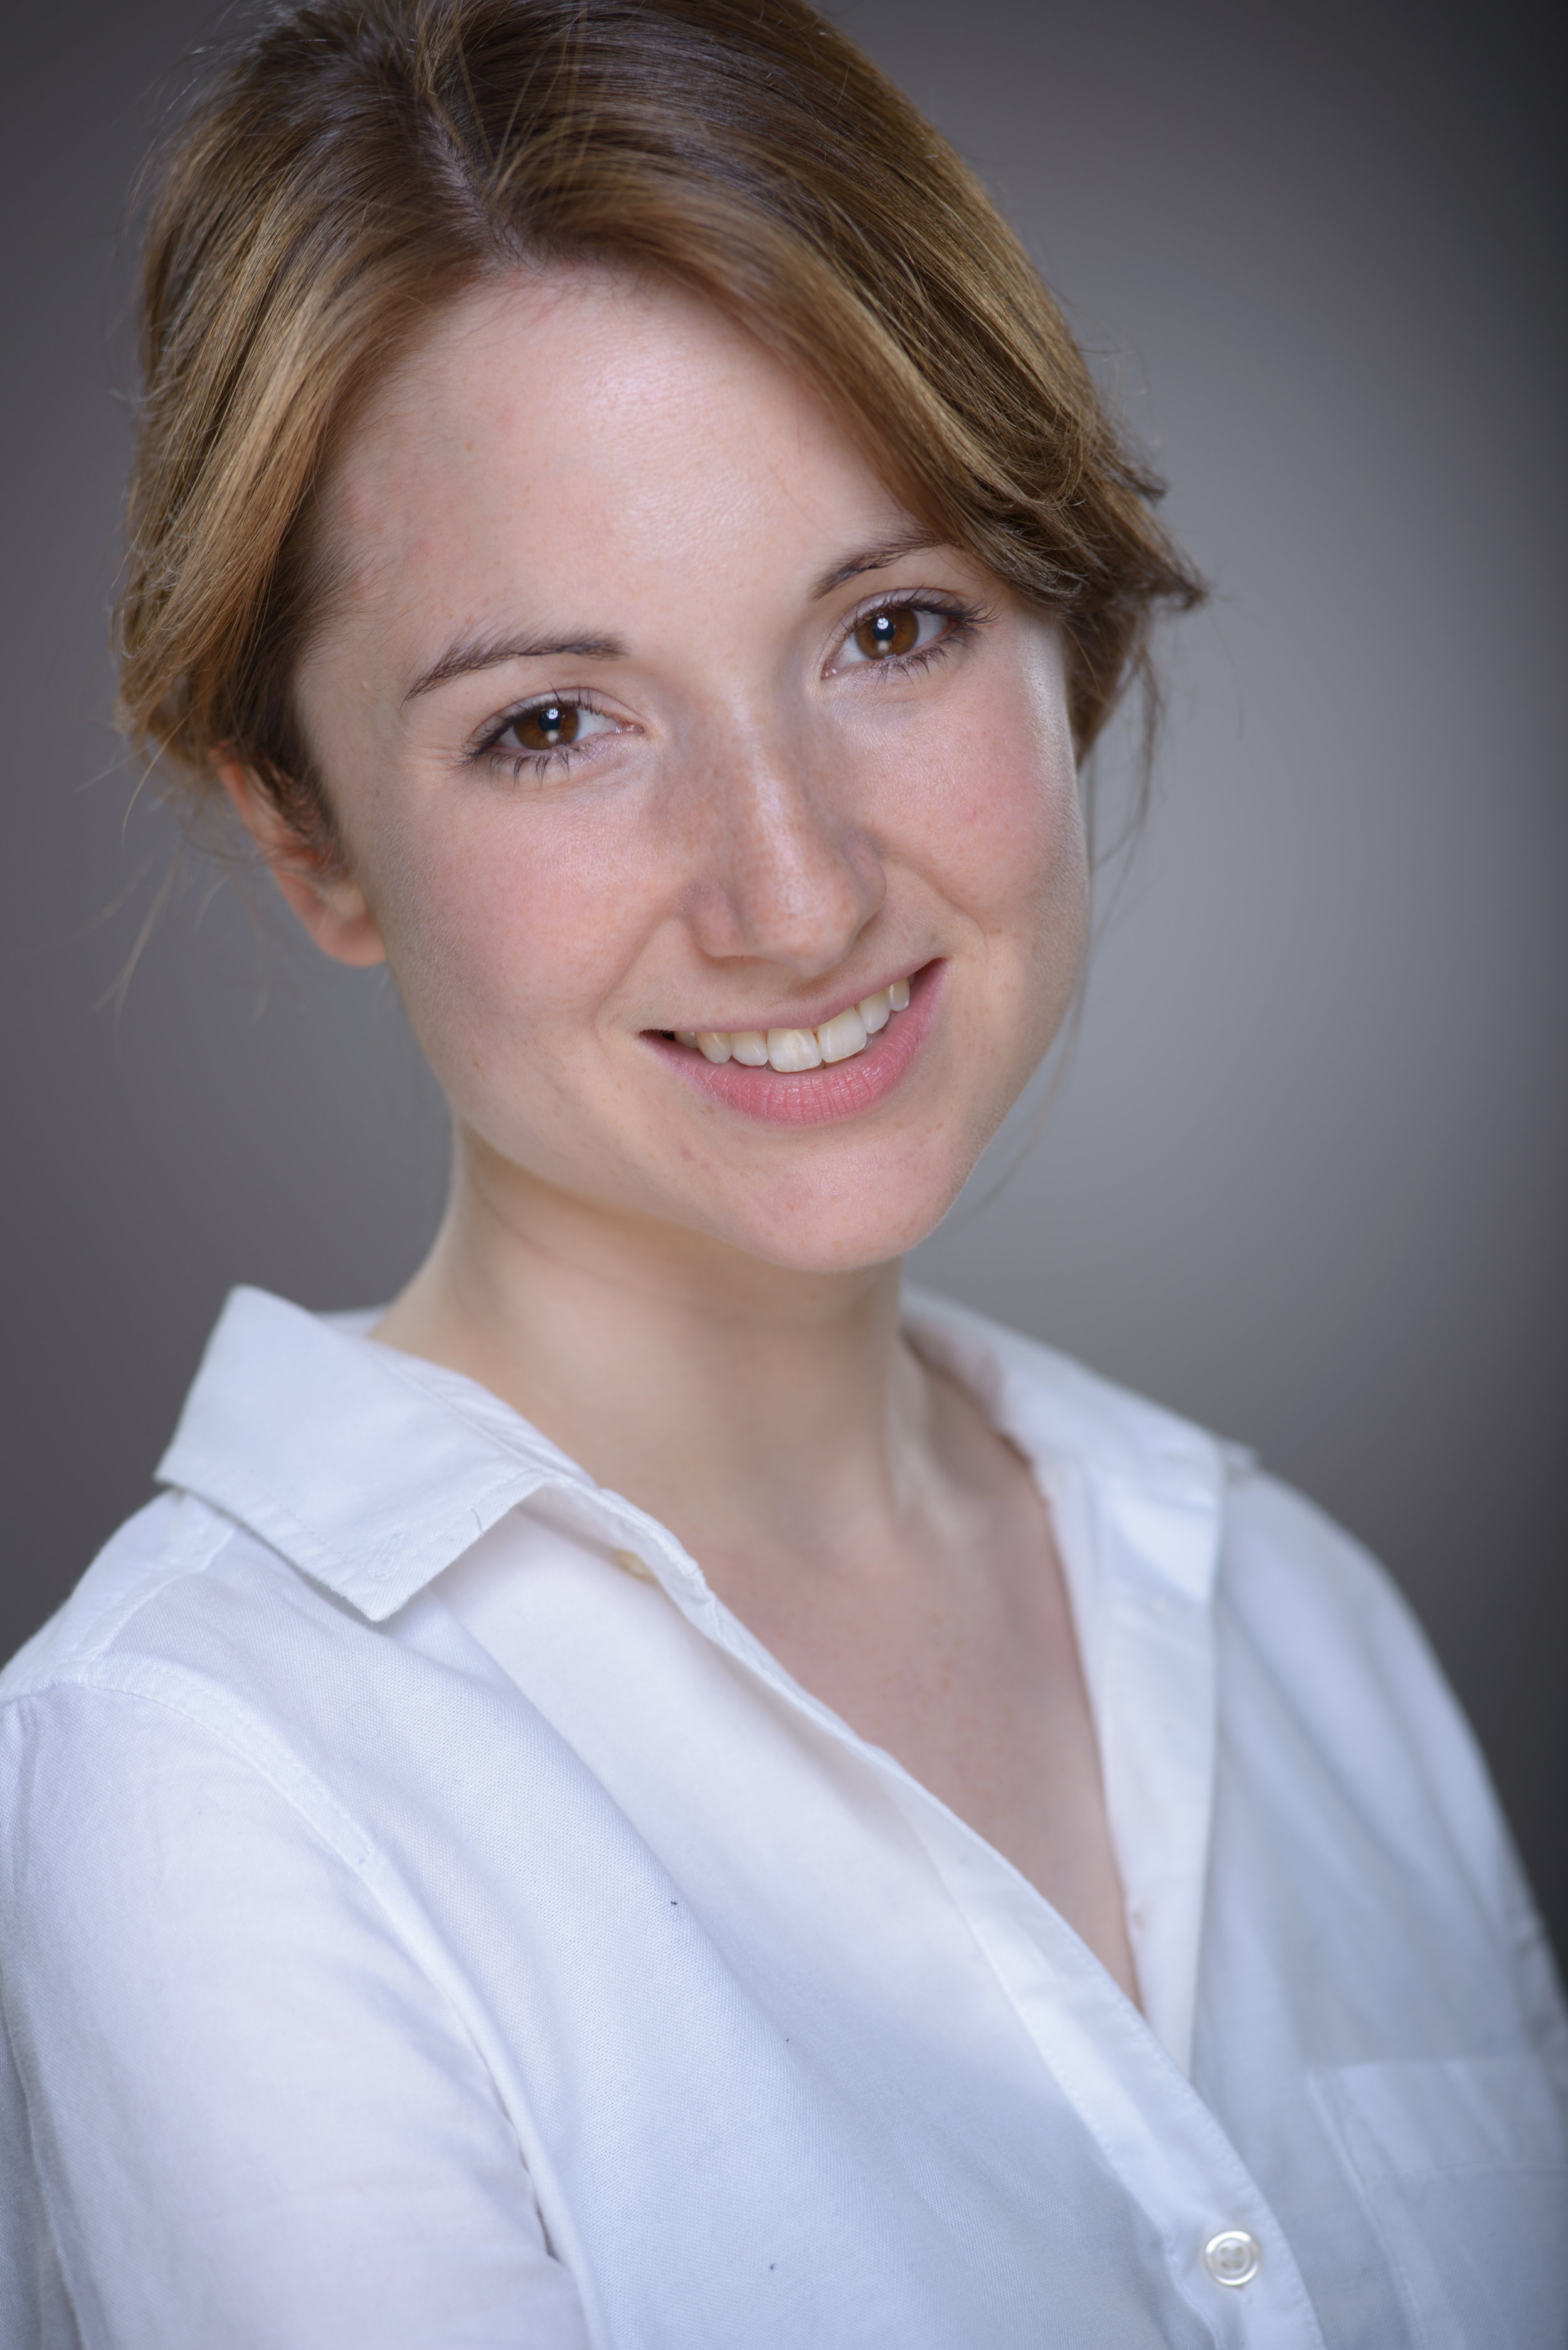 Laura Freeman, photographed by Alex Winn